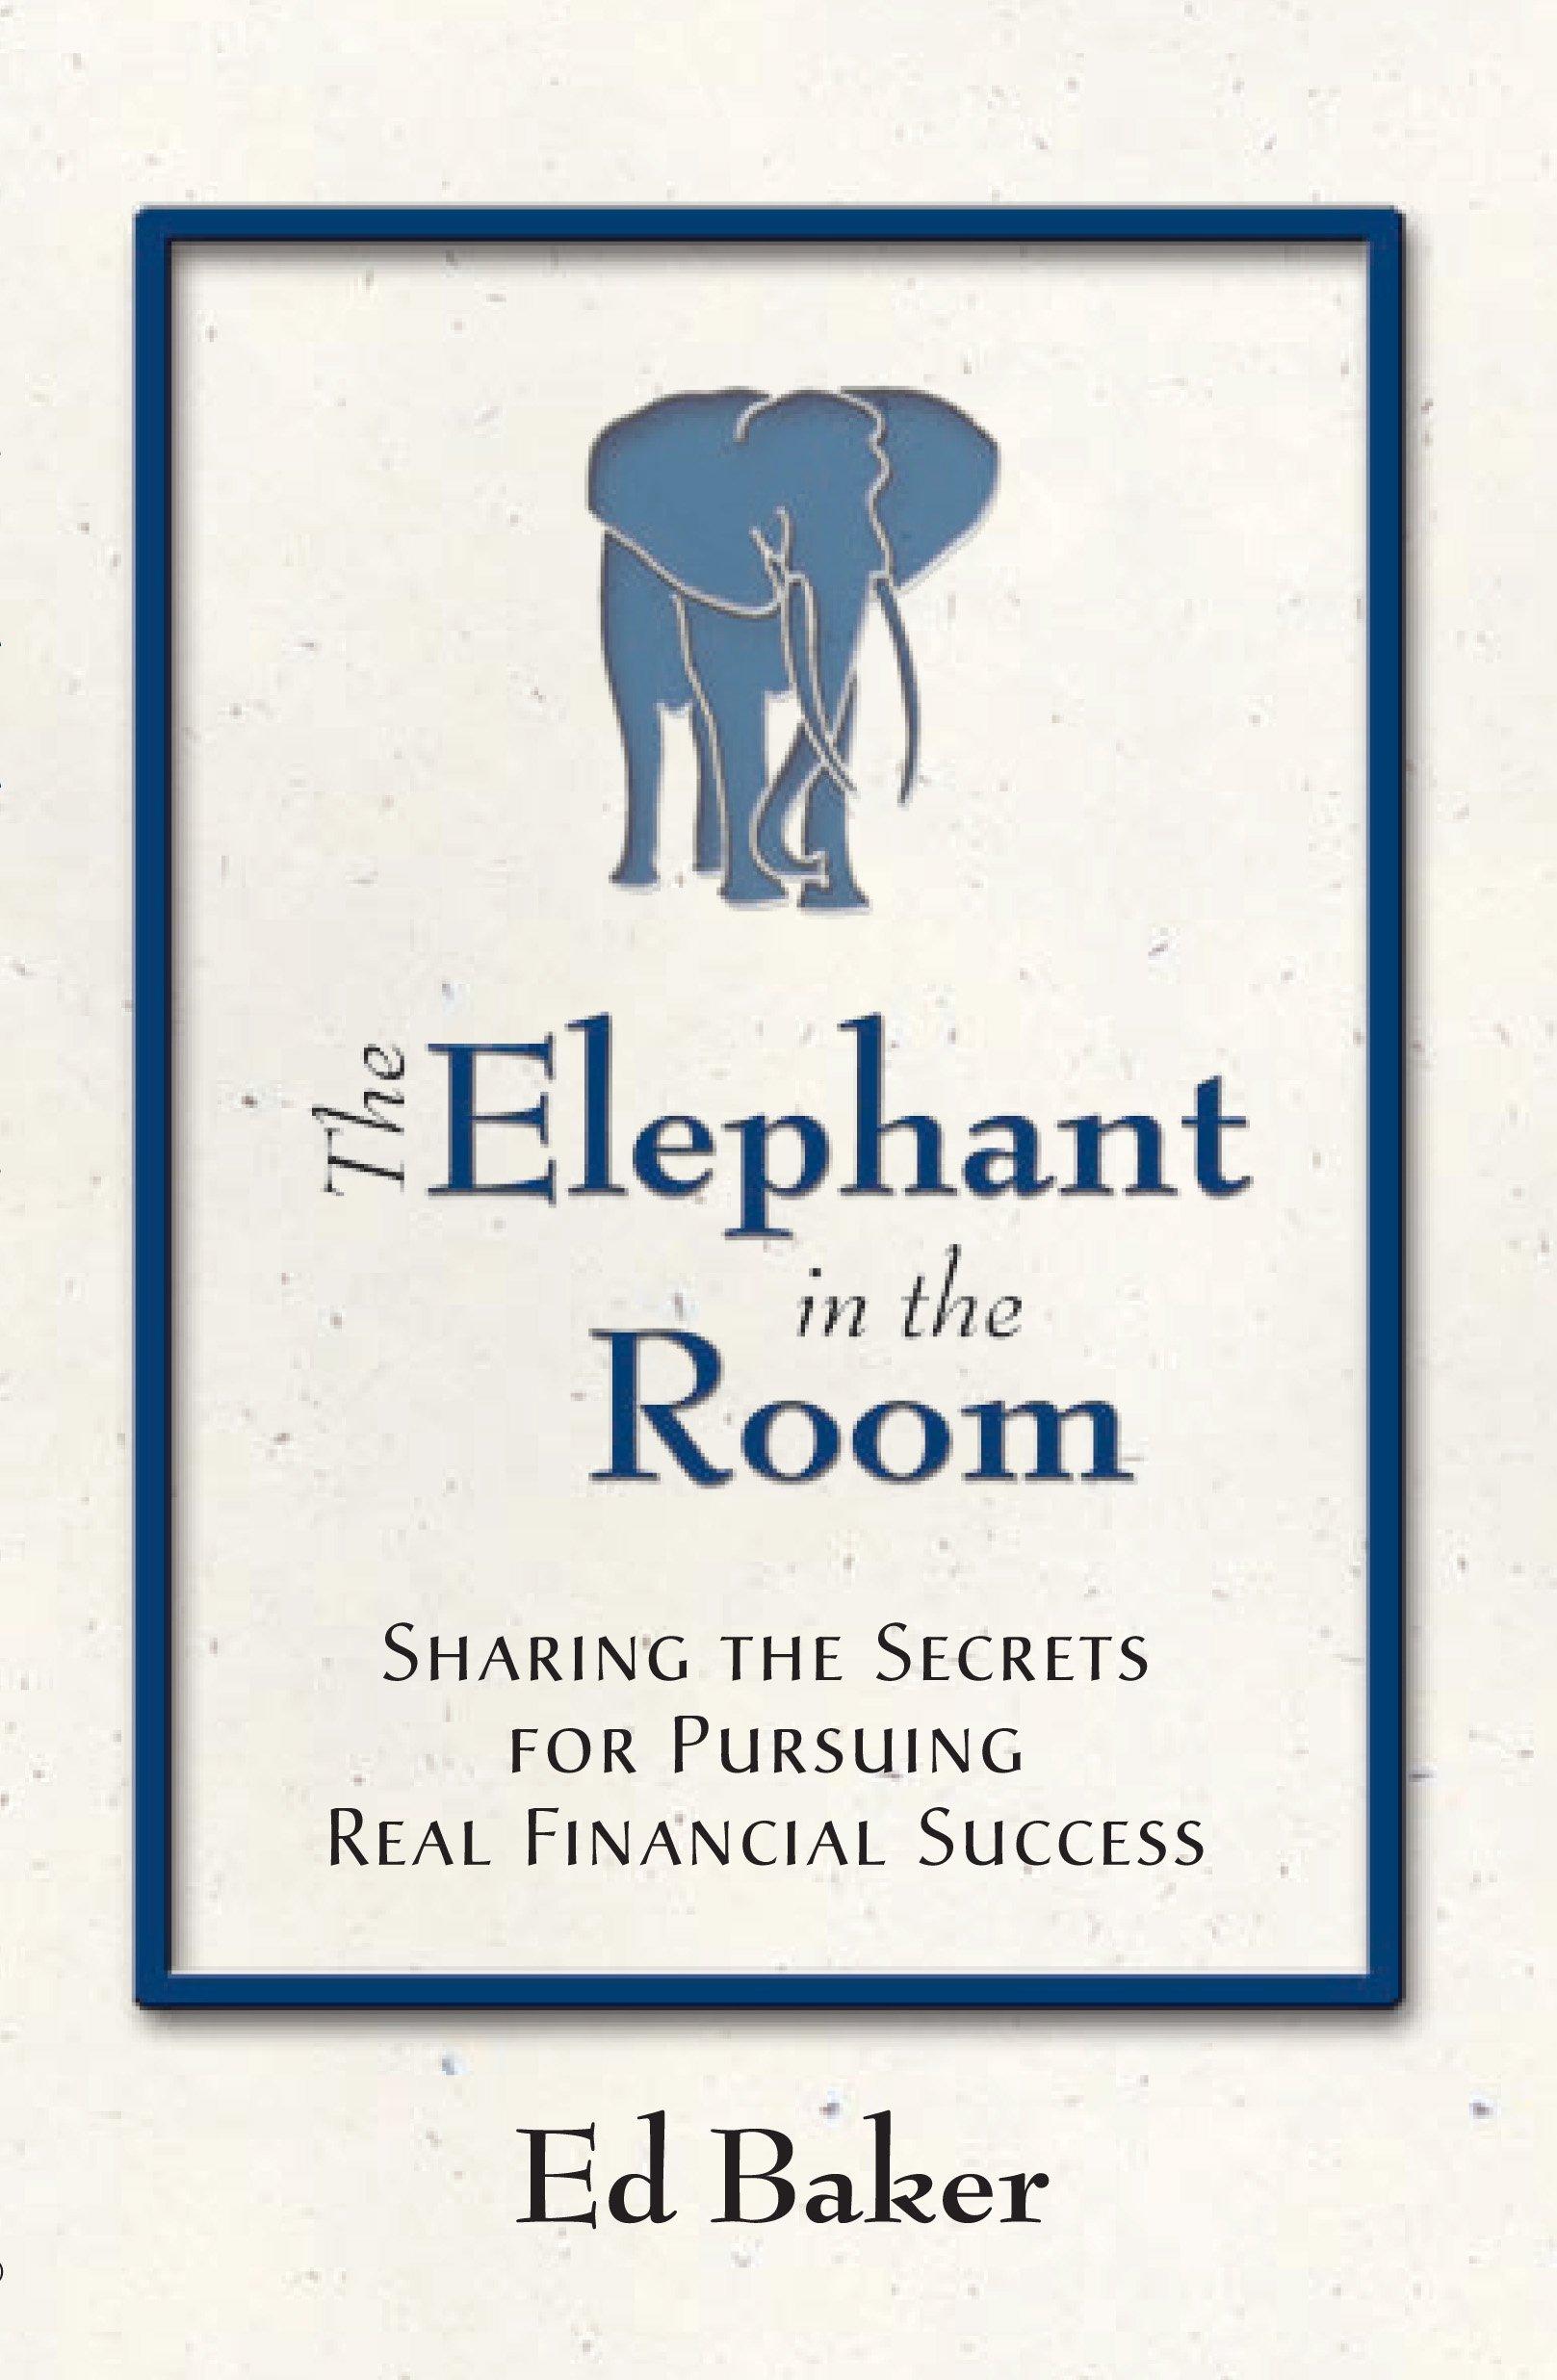 The Elephant in the Room: Ed Baker: 9780979365409: Amazon.com: Books